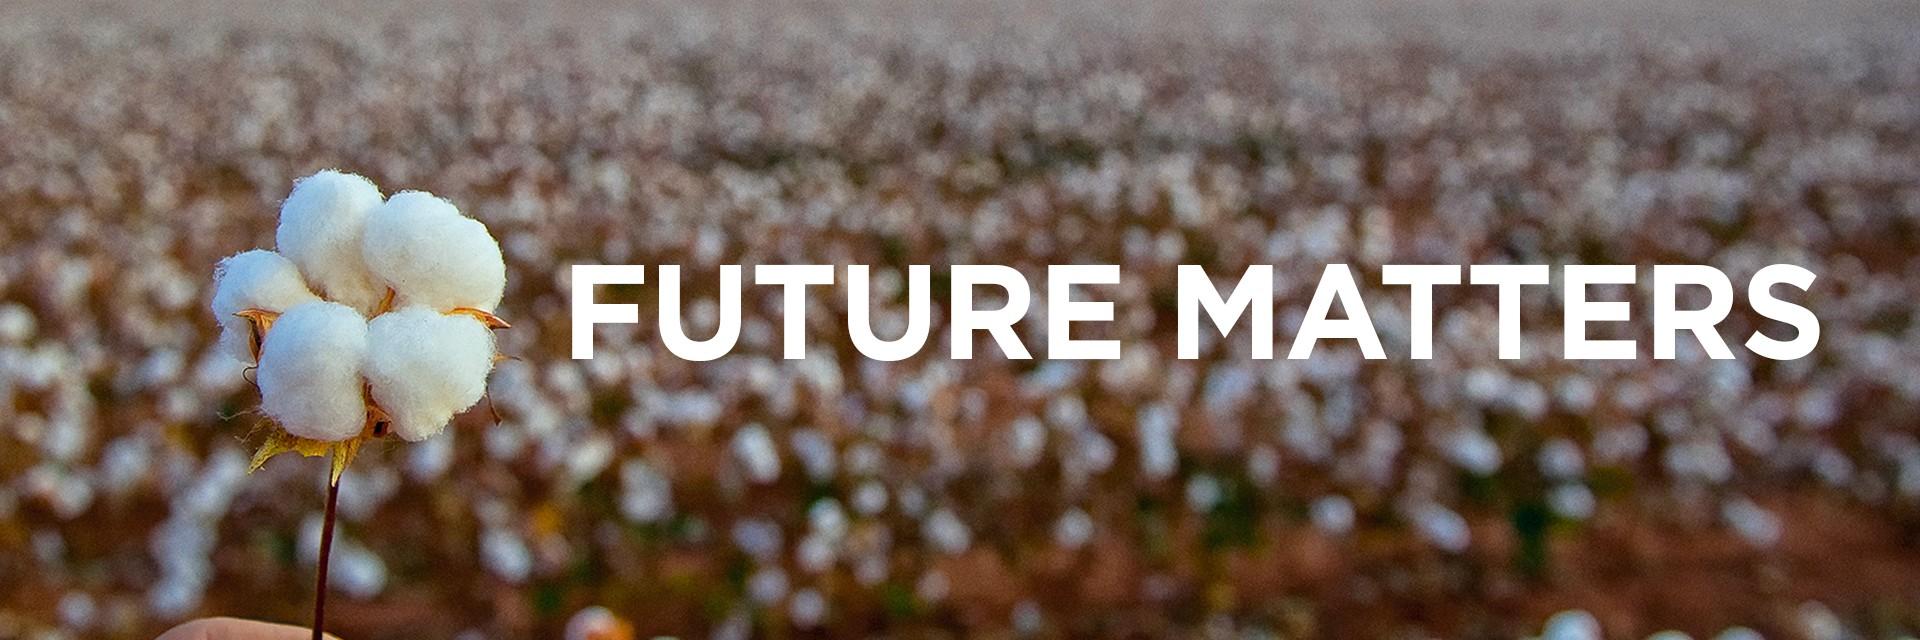 O futuro importa | Organic | Impetus underwear